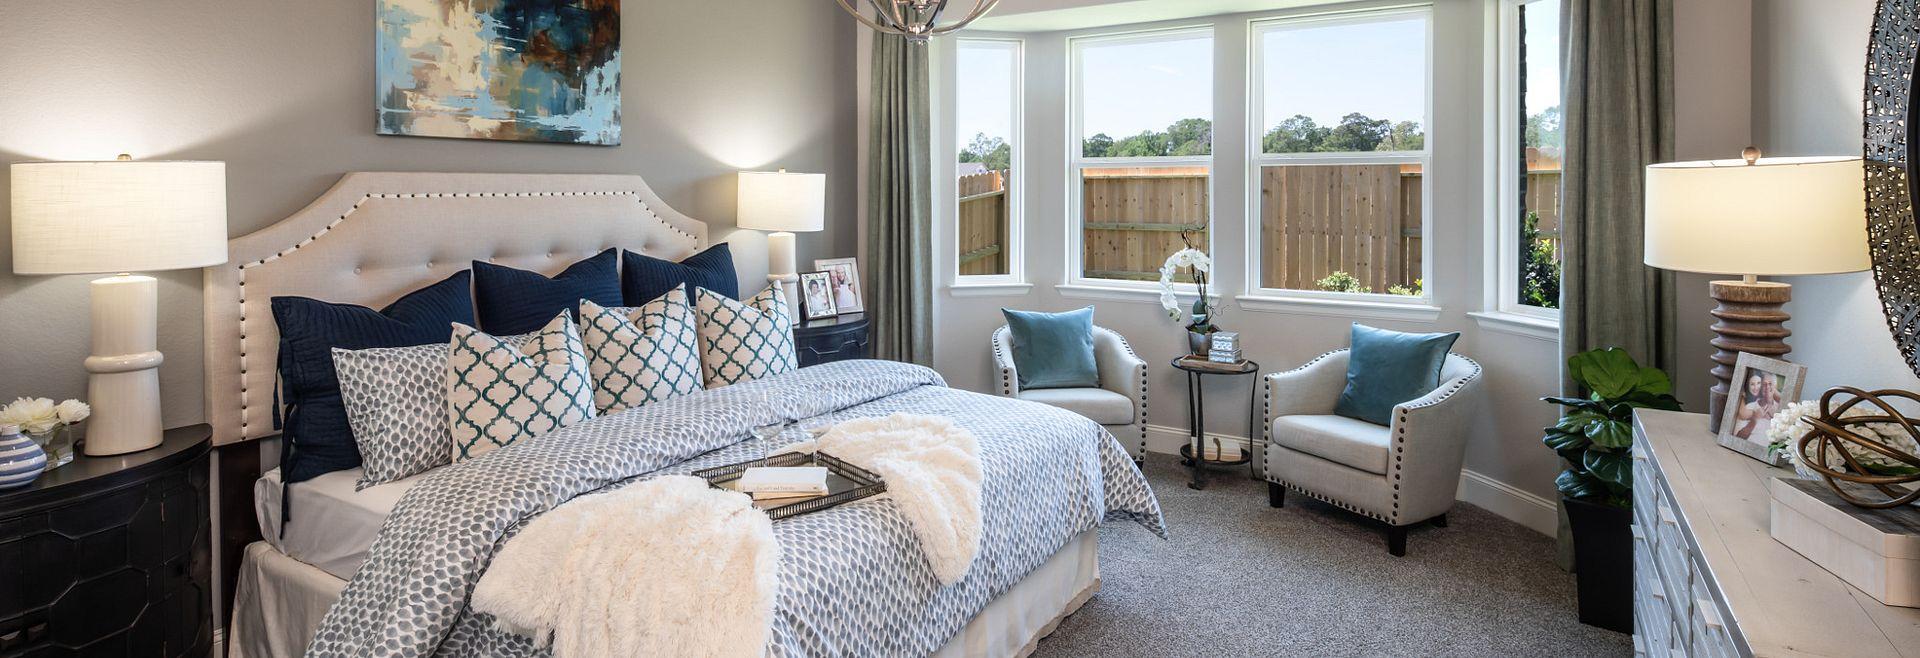 Balmoral Plan 4039 Primary Bedroom